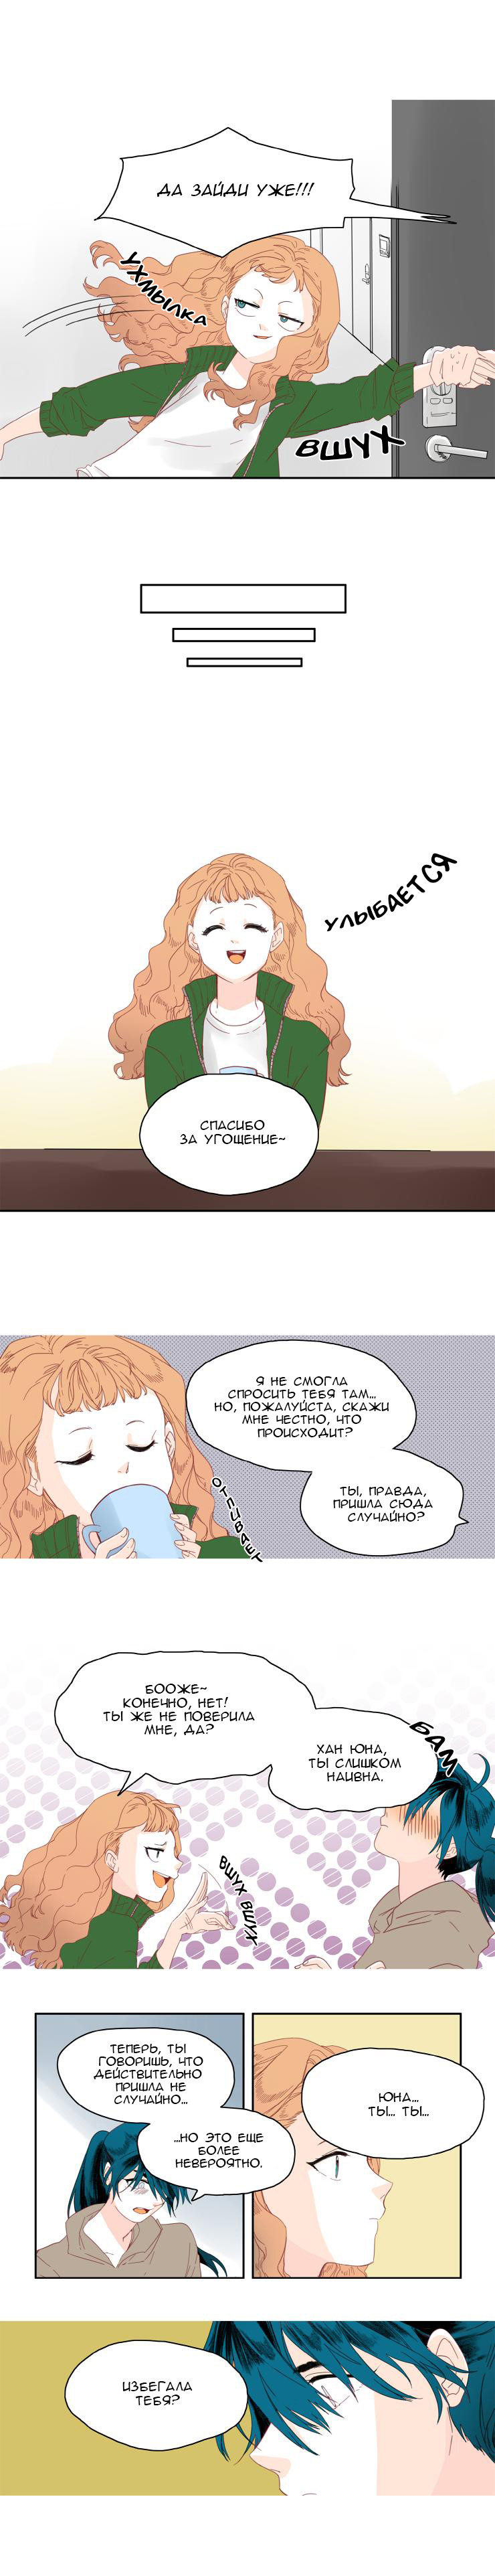 https://r1.ninemanga.com/comics/pic2/30/31902/344587/1512251398867.jpg Page 4